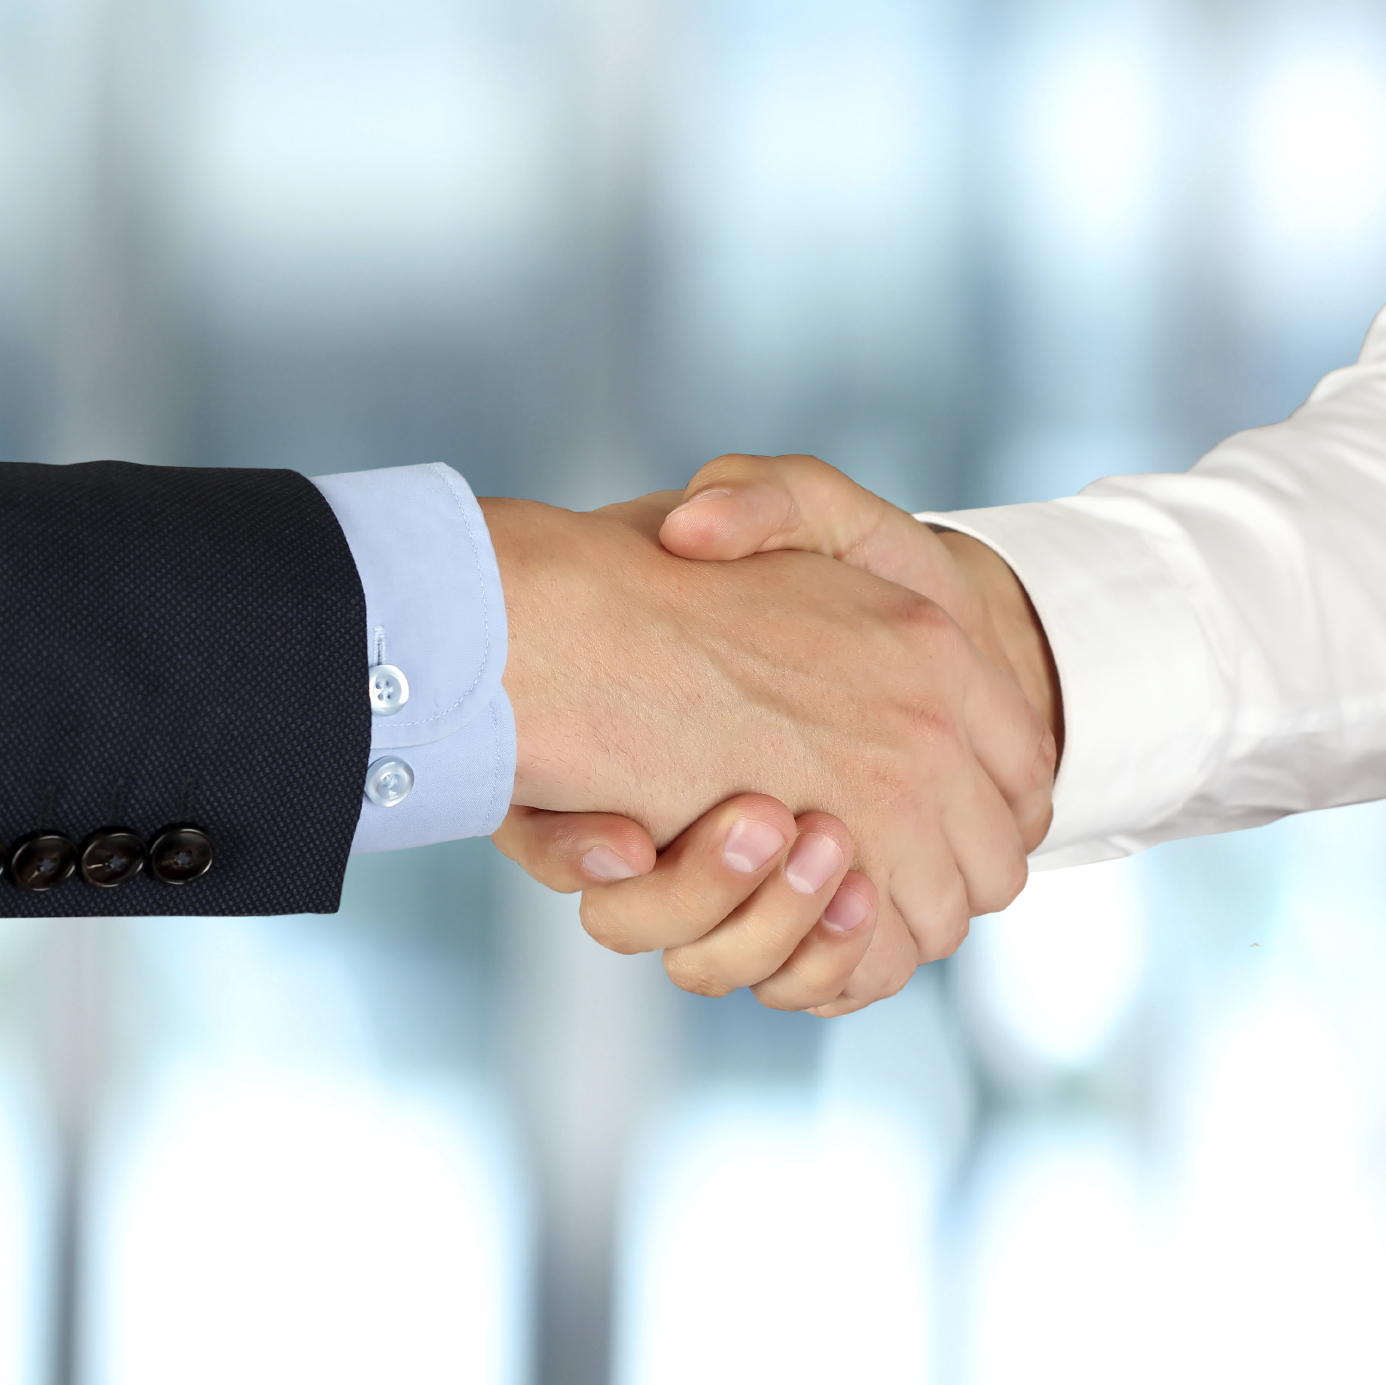 Days of the Handshake Gone!